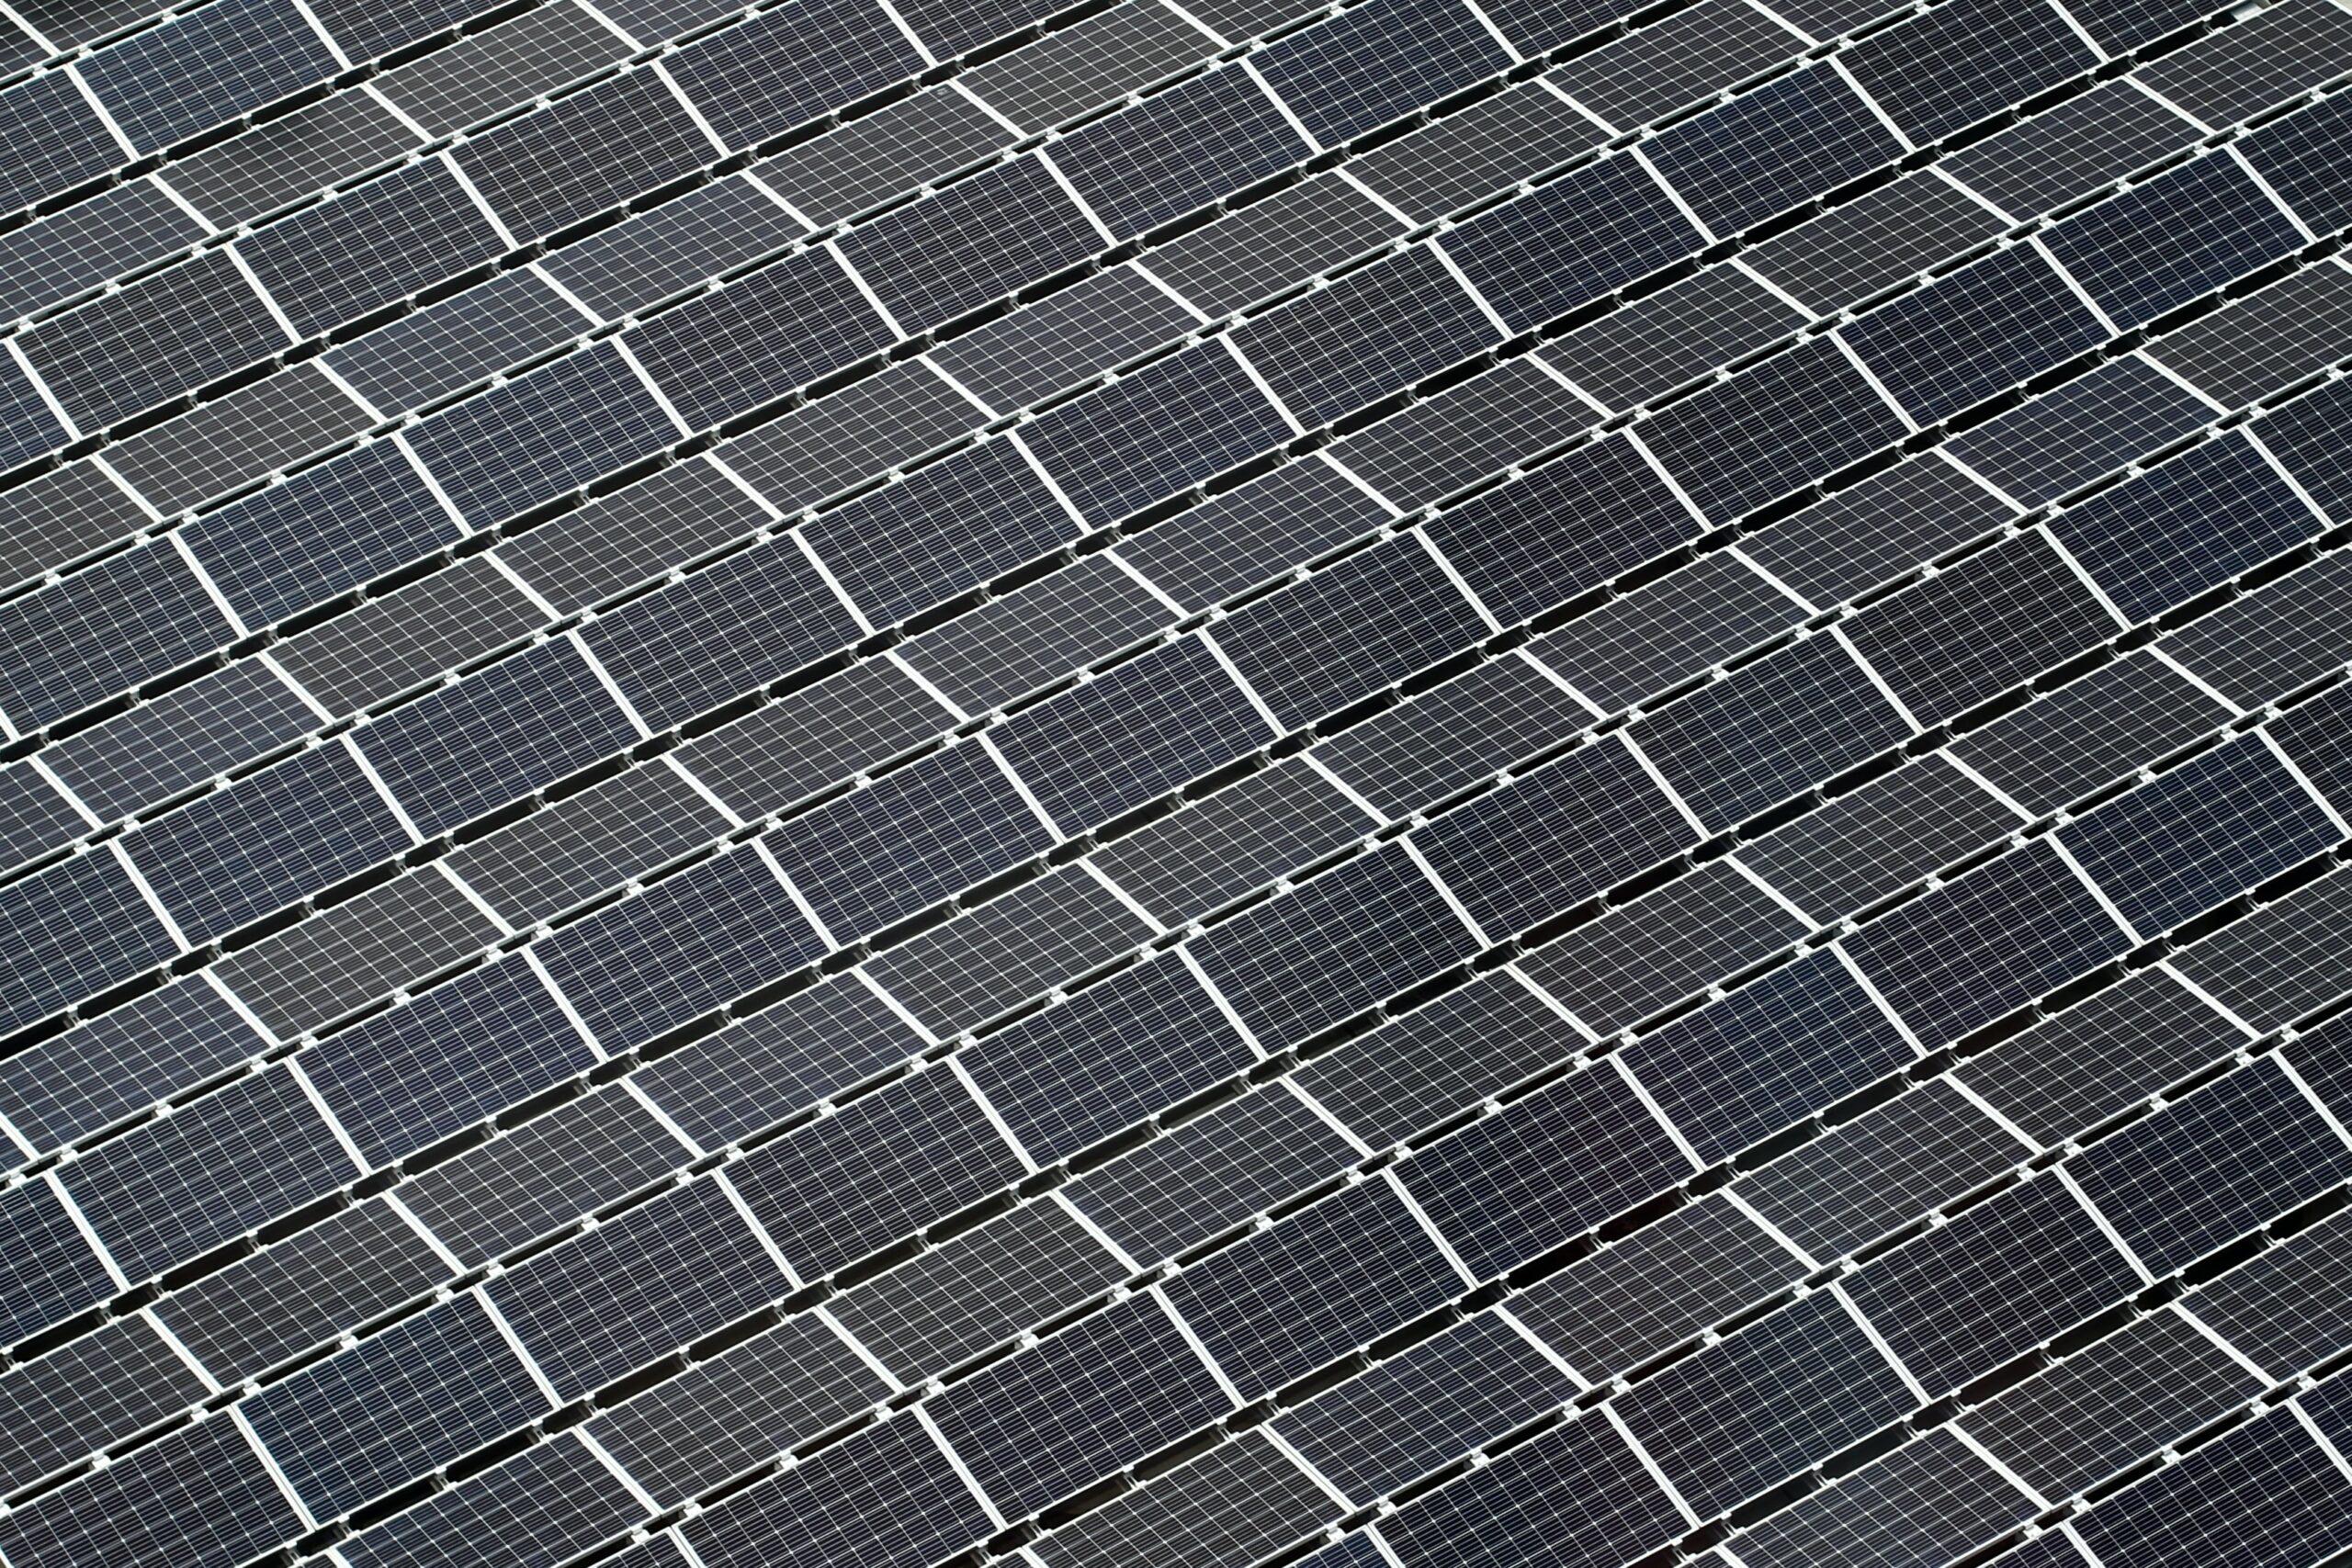 Nova Druck Photovoltaik Anlage